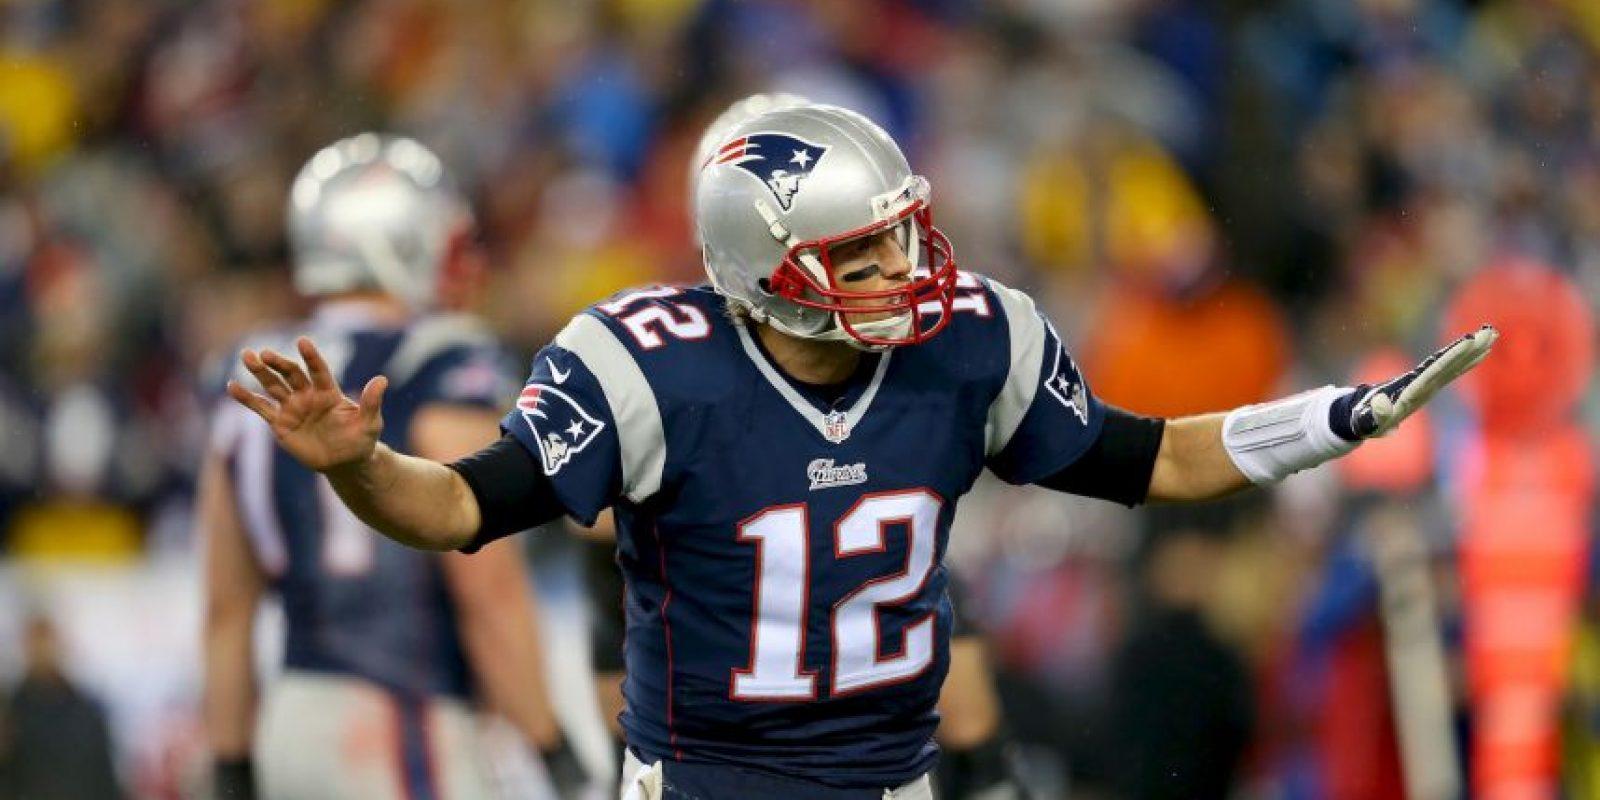 El líder de los Pats ha ganado tres Super Bowls Foto:Getty